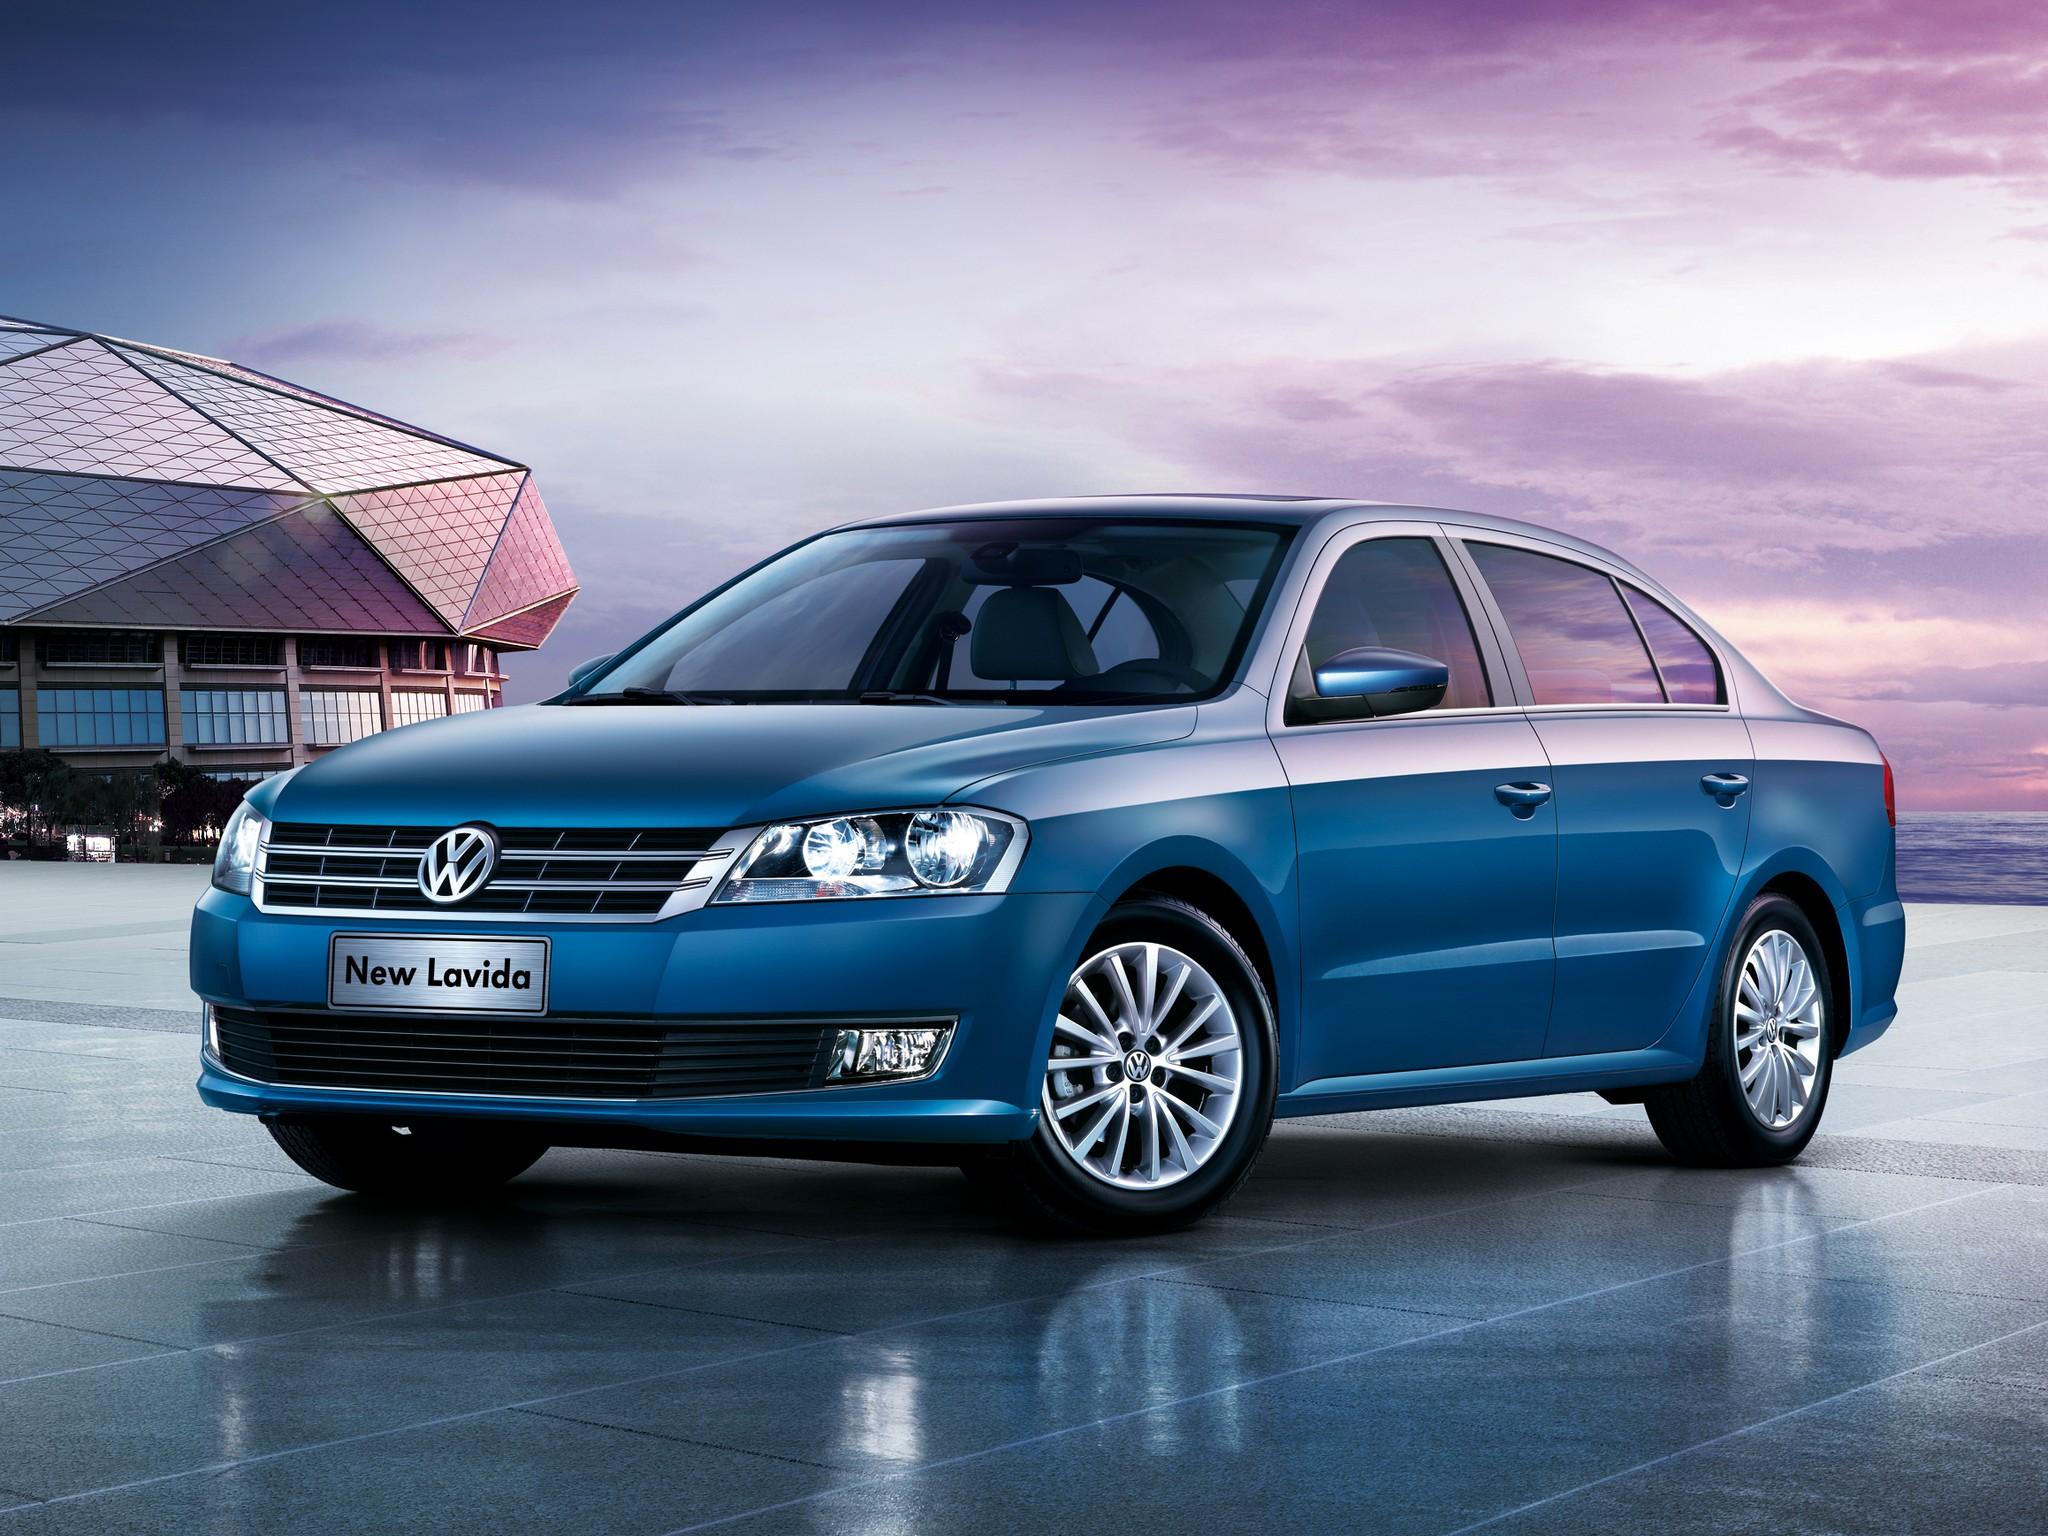 Volkswagen Lavida photos - PhotoGallery with 12 pics| CarsBase.com